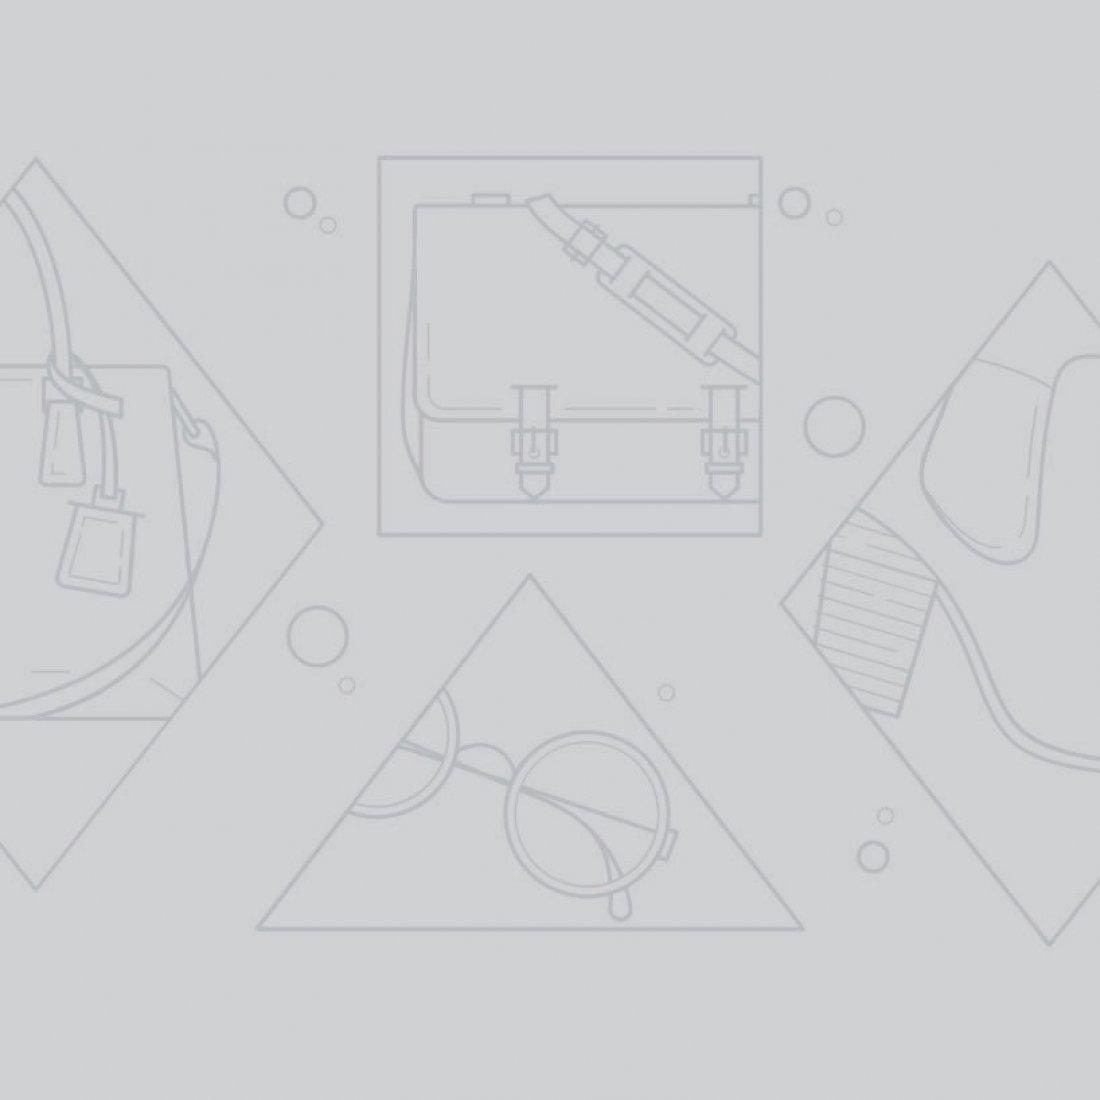 Светящиеся палочки Единороги, оптом - фото 1